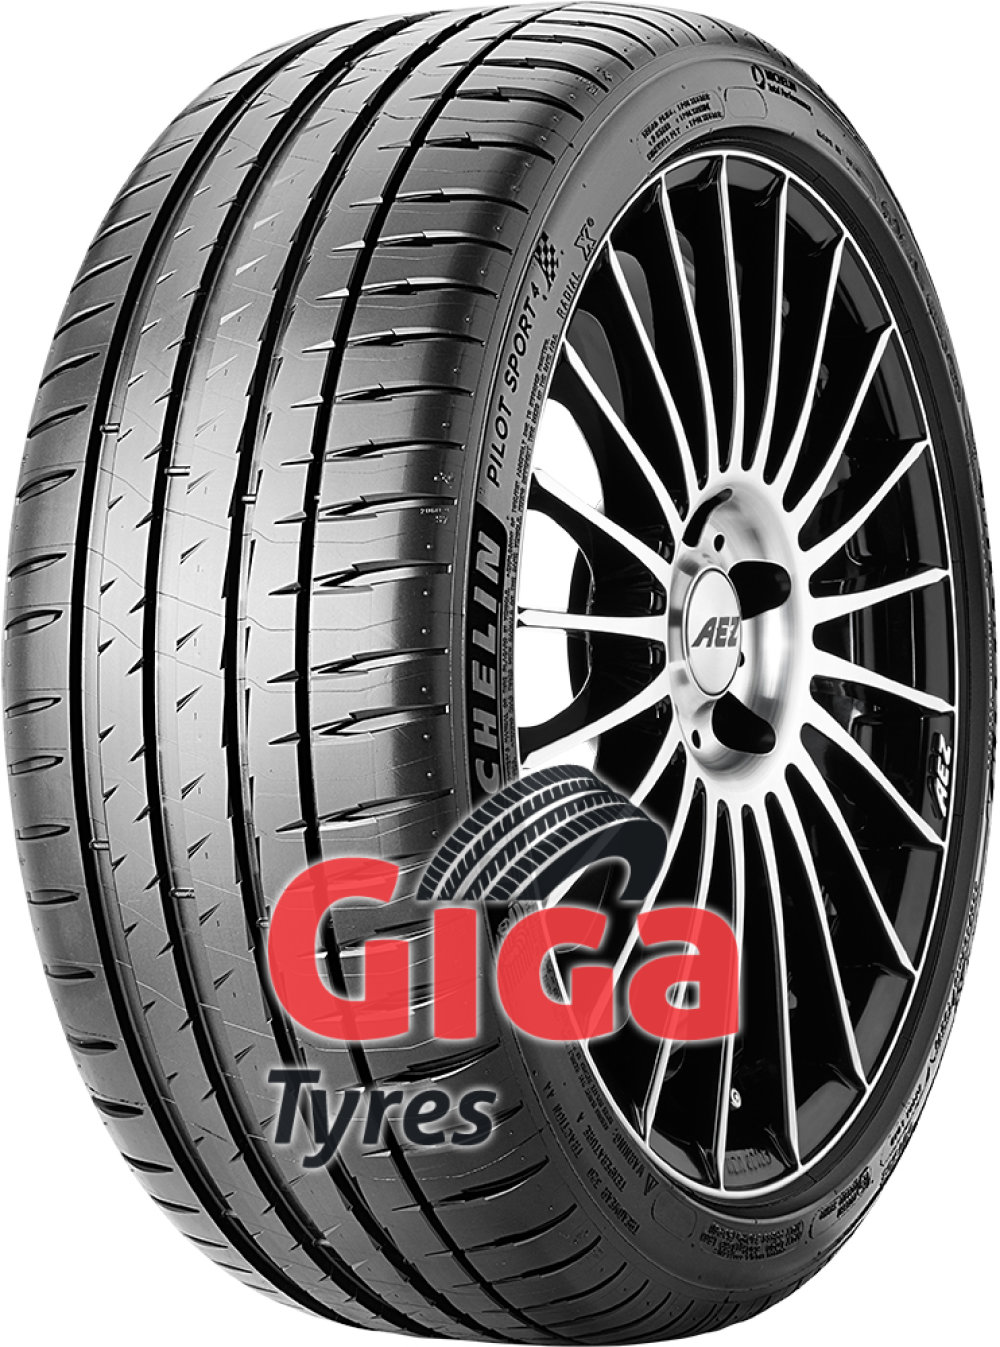 Michelin Pilot Sport 4 ( 265/35 ZR18 (97Y) XL with rim protection ridge (FSL) )